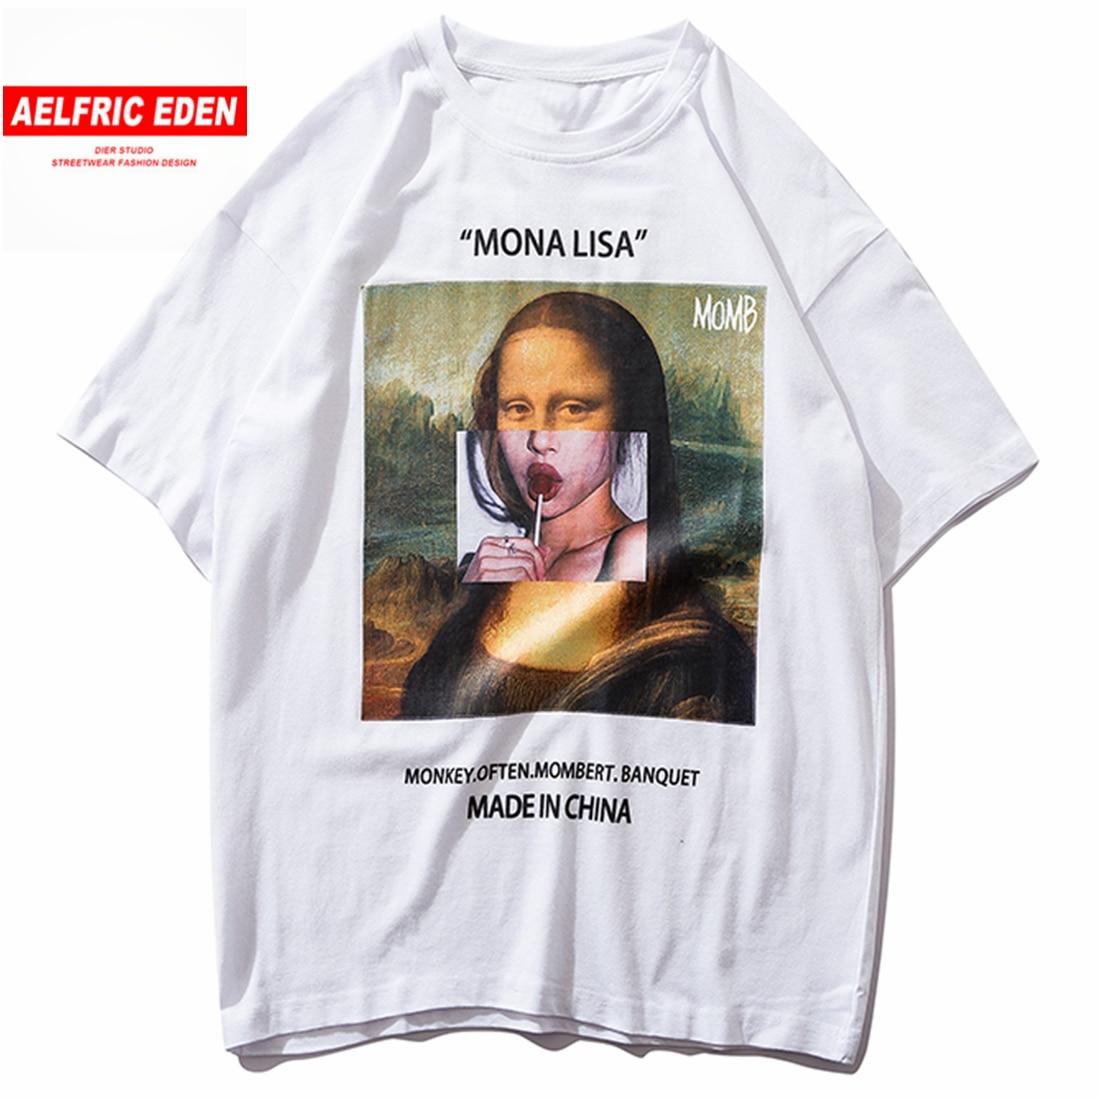 Aelfric eden engraçado mona lisa hip hop t camisa masculina de algodão moda streetwear harajuku tshirt manga curta topos tees hipster swag